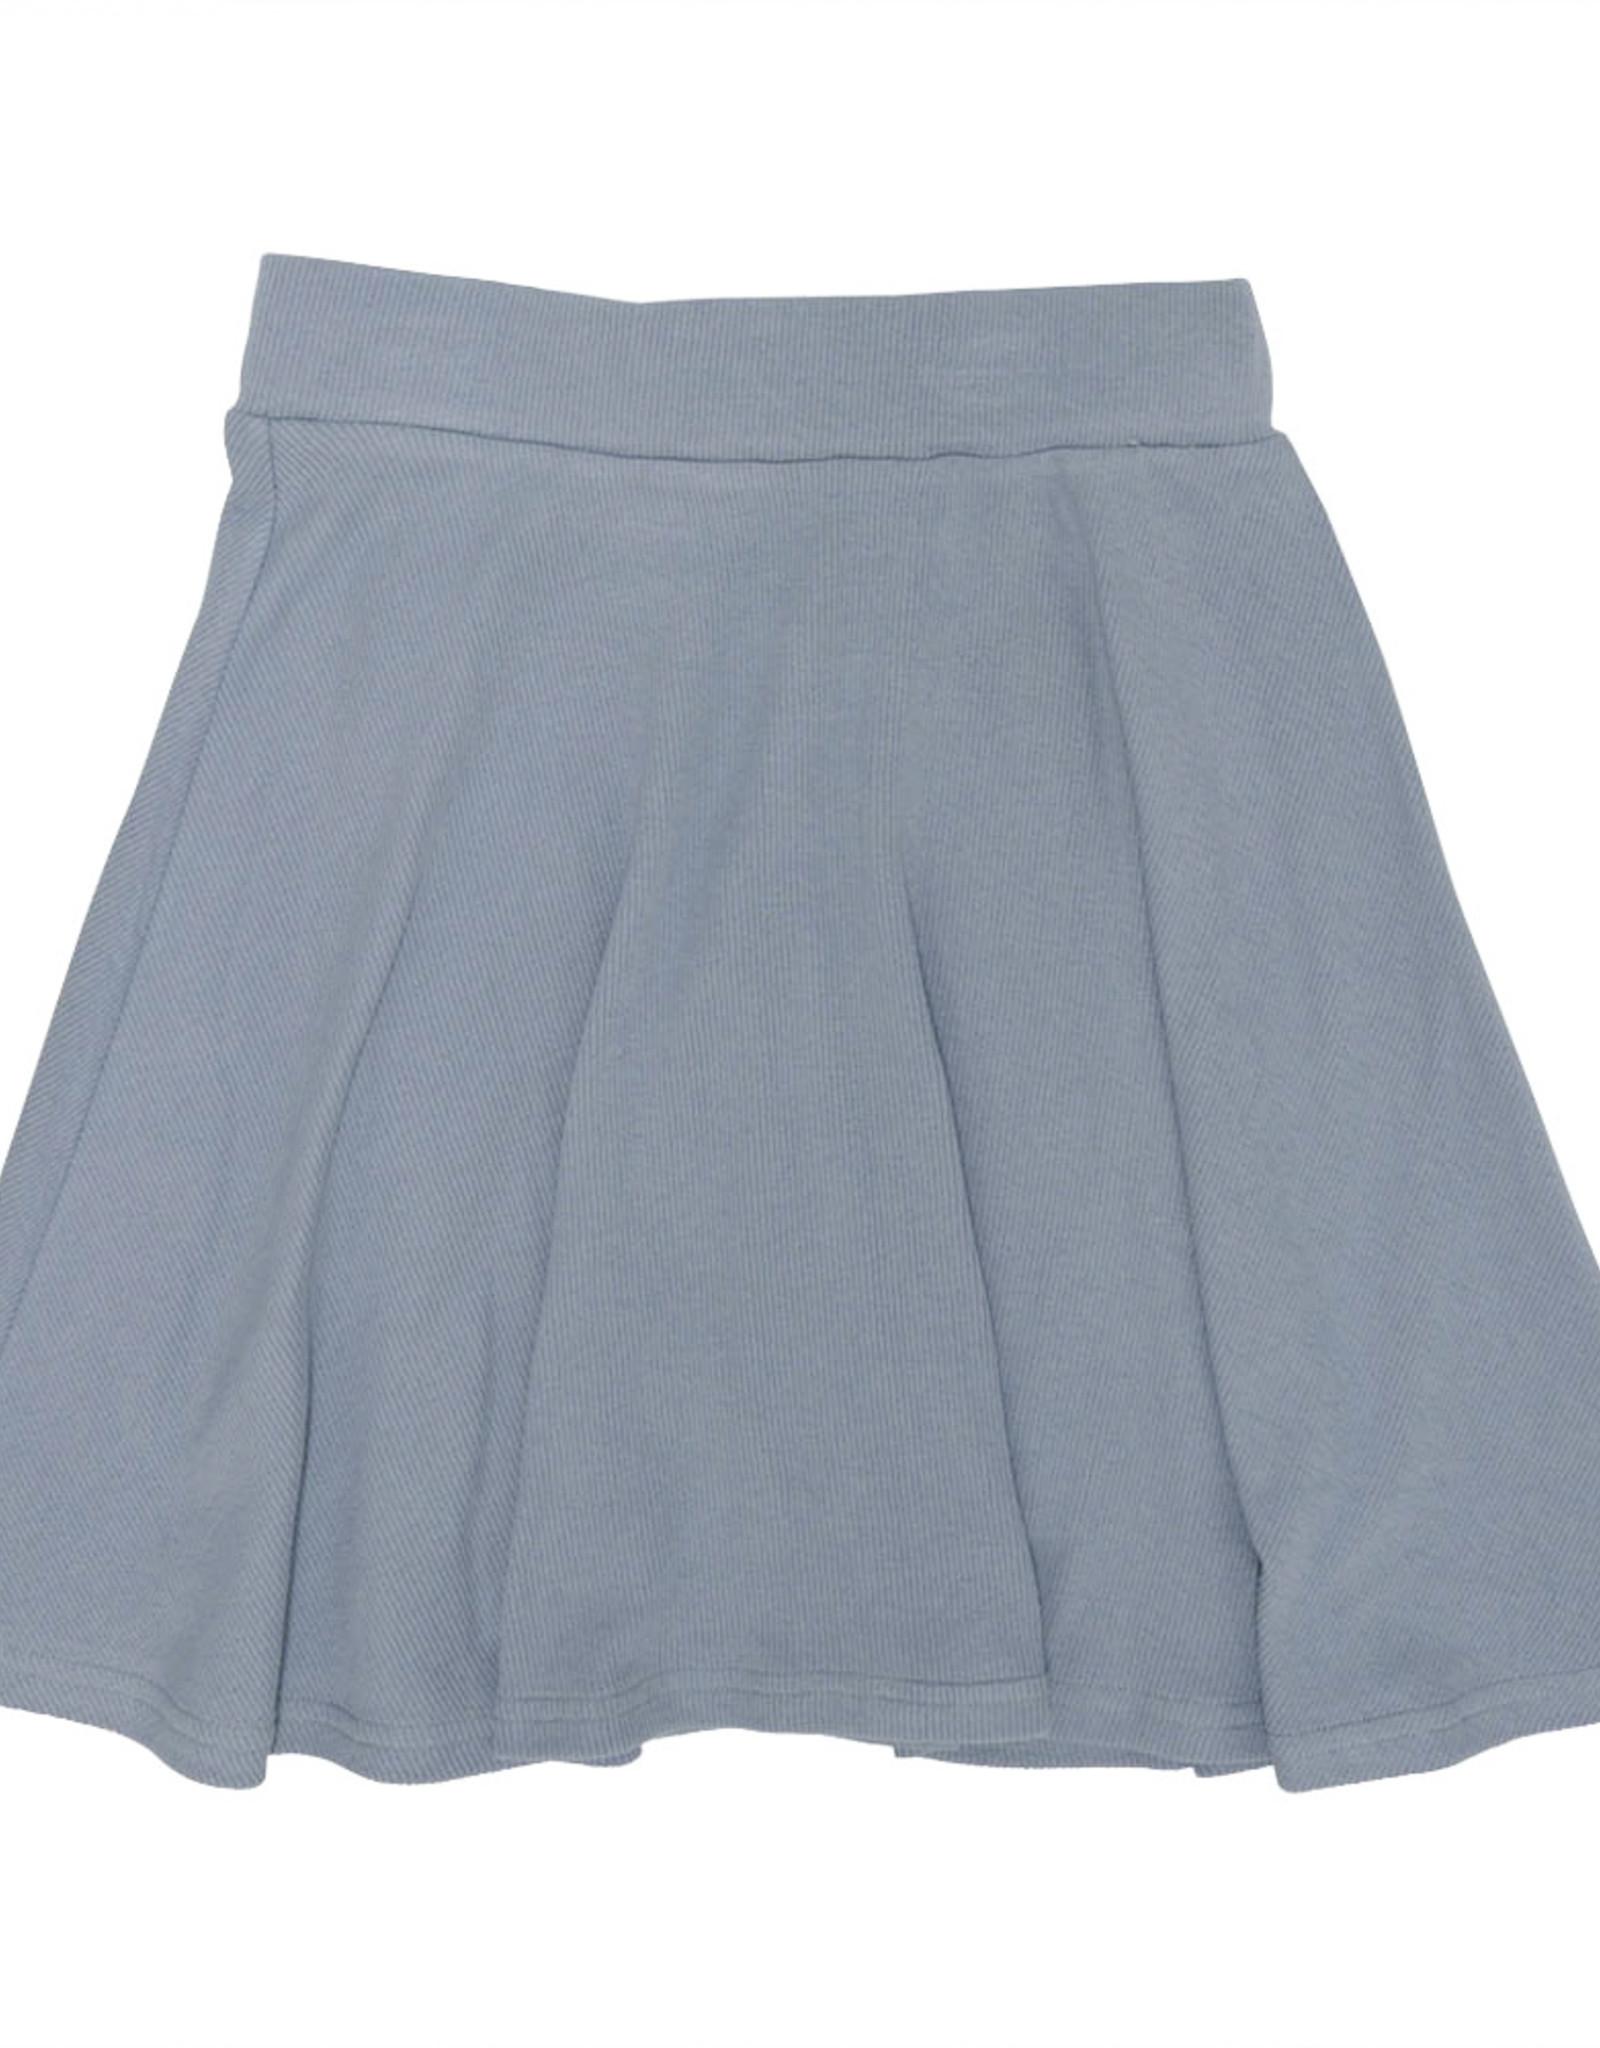 PeekABoo Peek A Boo Soft Ribbed Aline Skirt